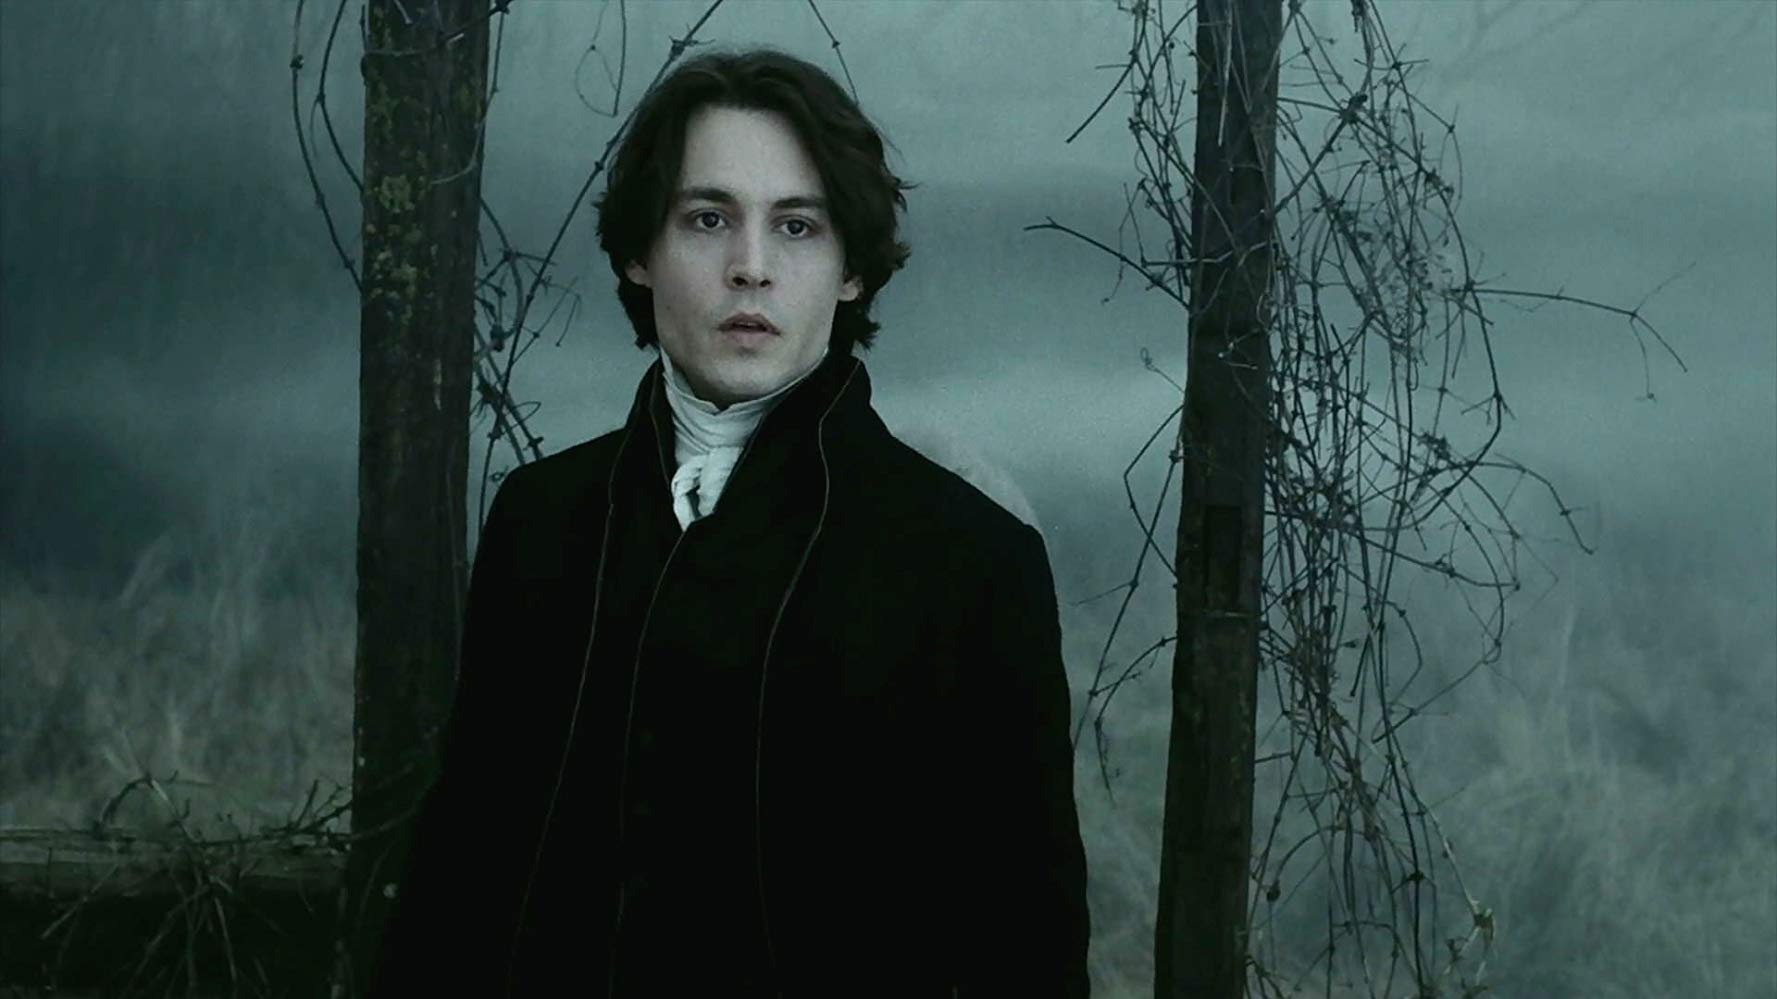 Johnny Depp as Constable Ichabod Crane in Sleepy Hollow (1999)